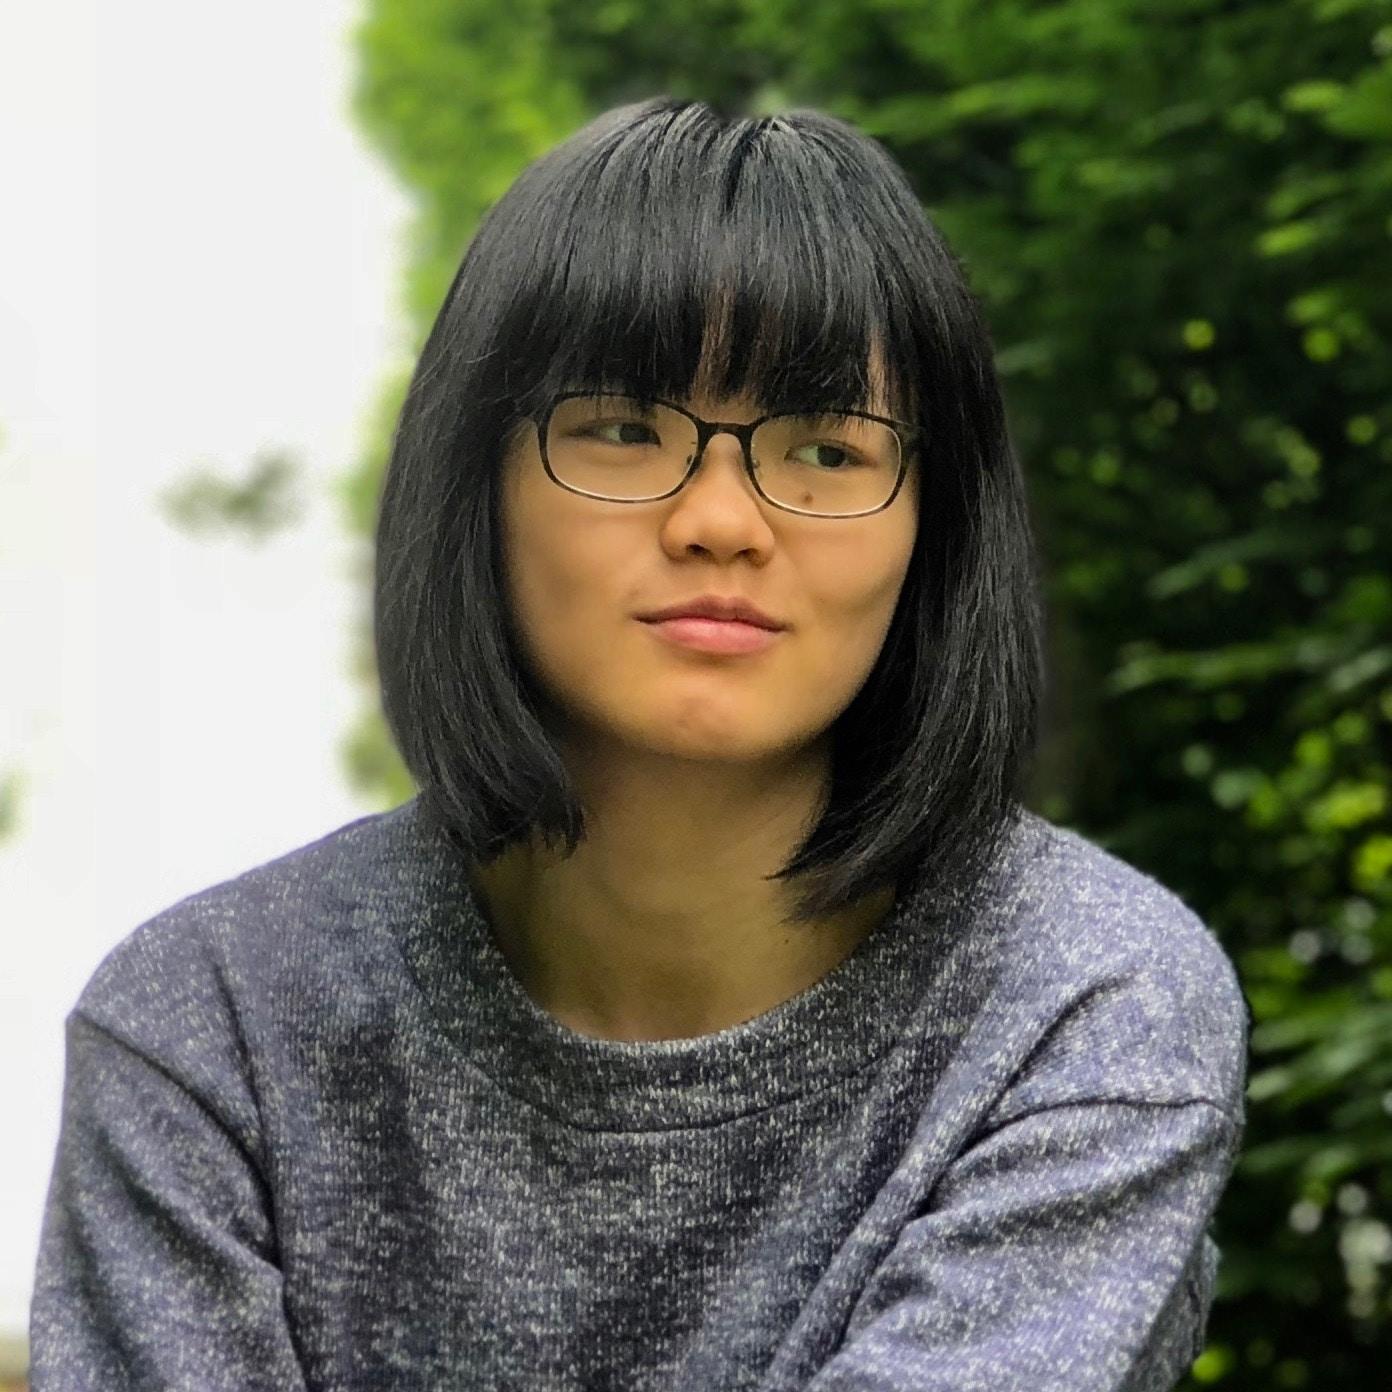 Avatar of user Weiwei Hsu